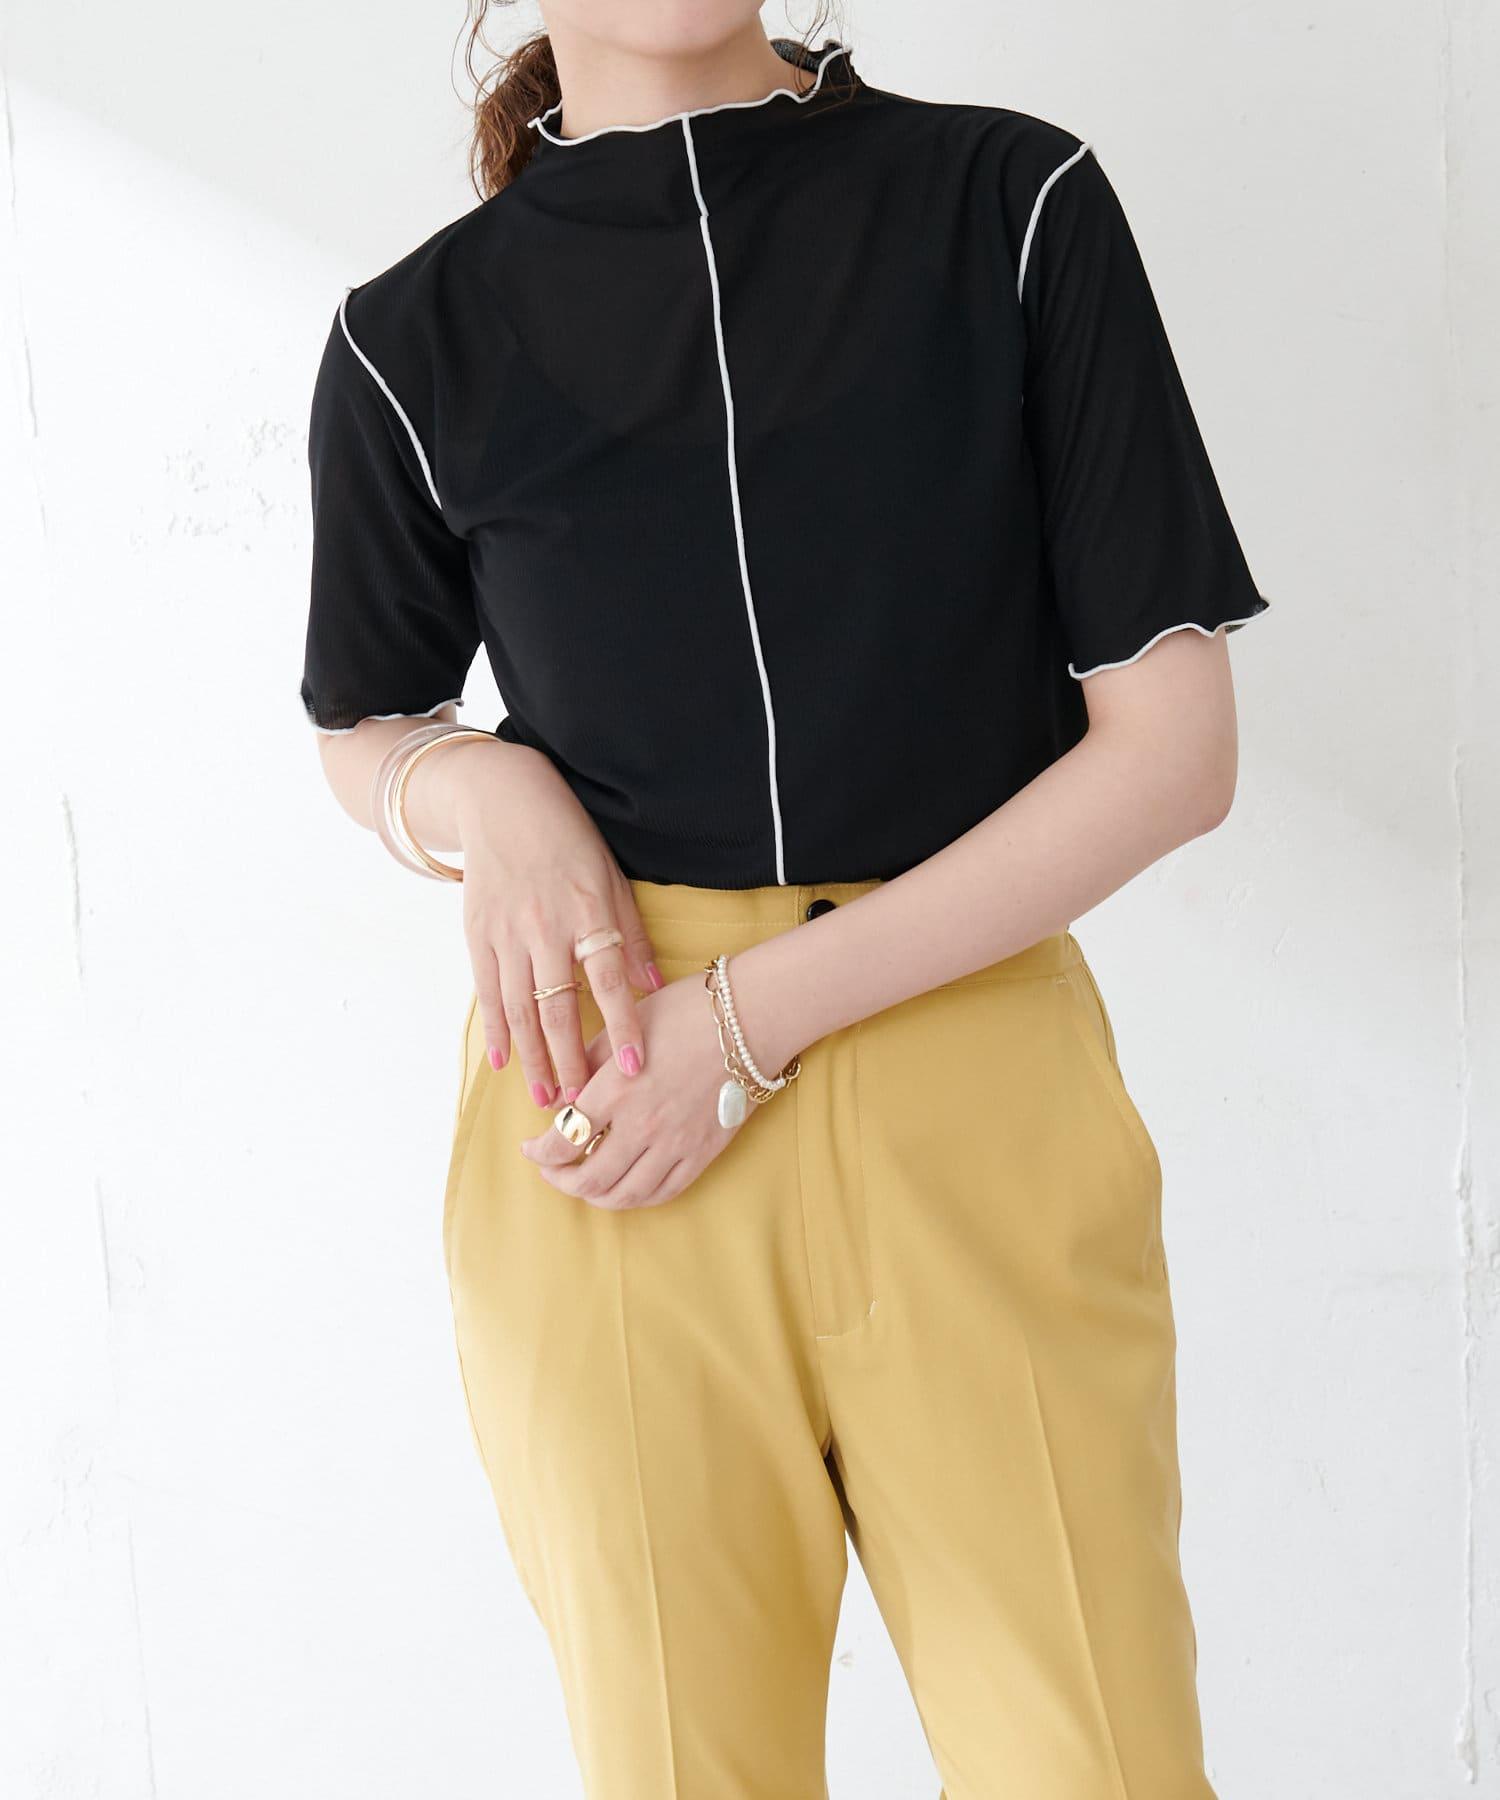 Discoat(ディスコート) 【WEB限定】配色メロートップス≪新色追加!≫